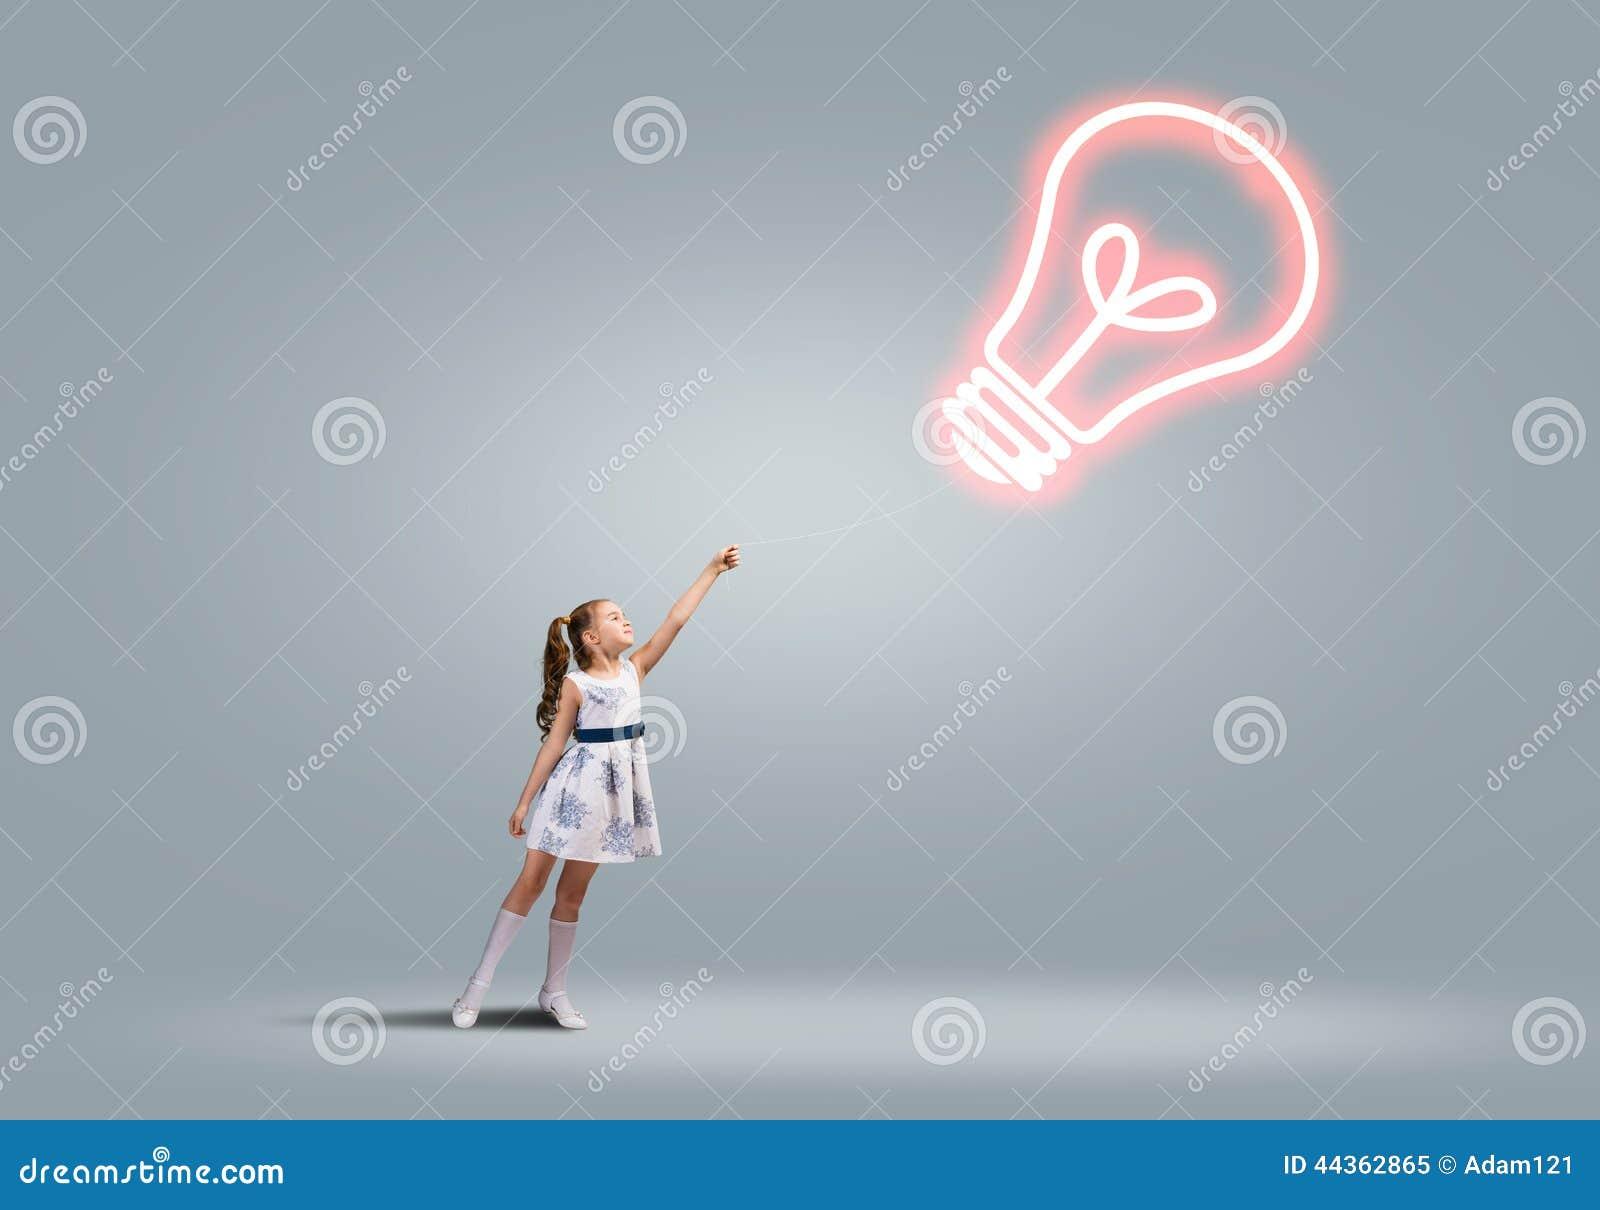 Idea luminosa